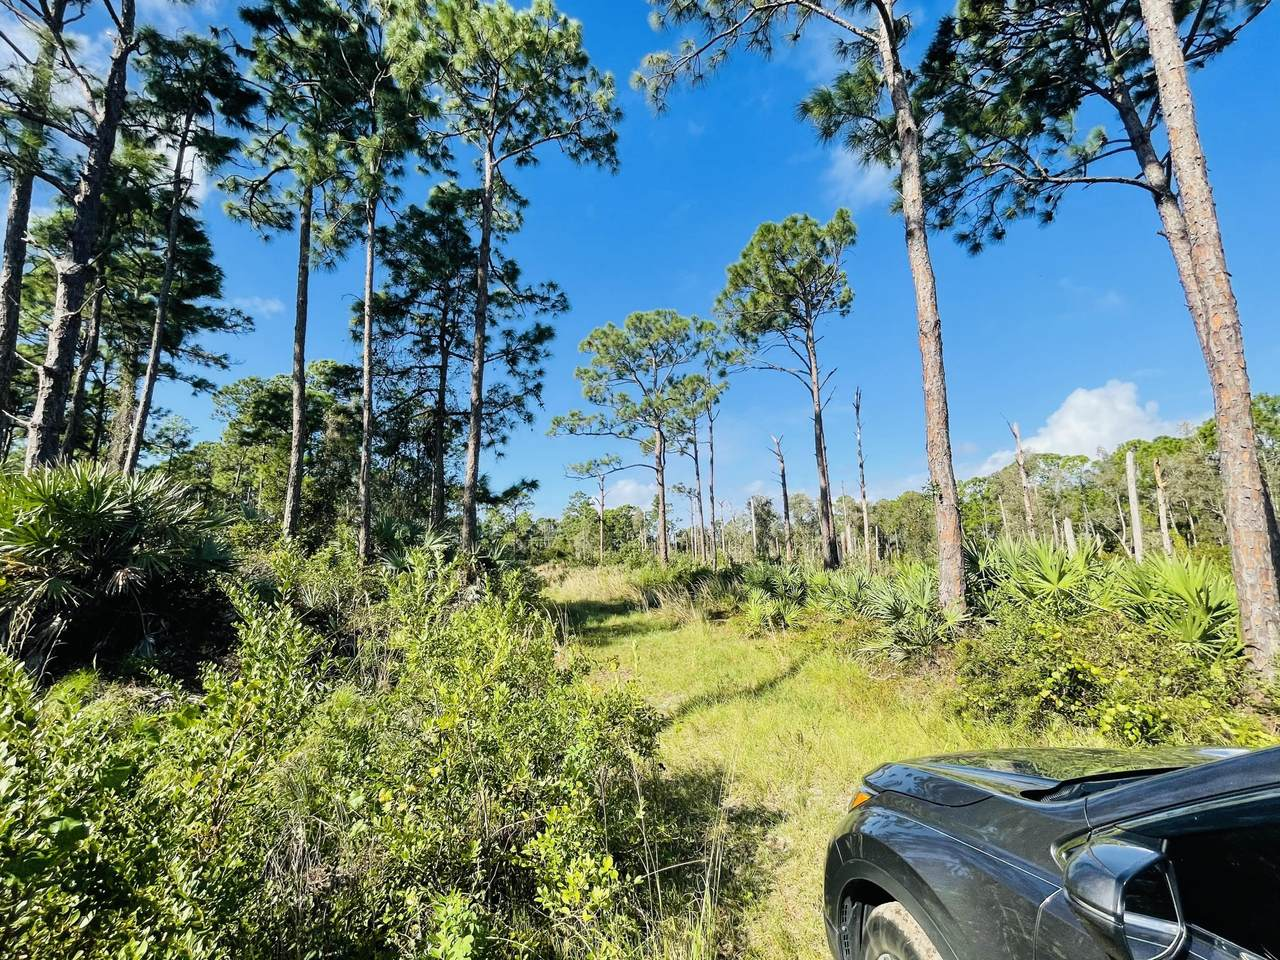 0 Treetop Trail Trail - Photo 1